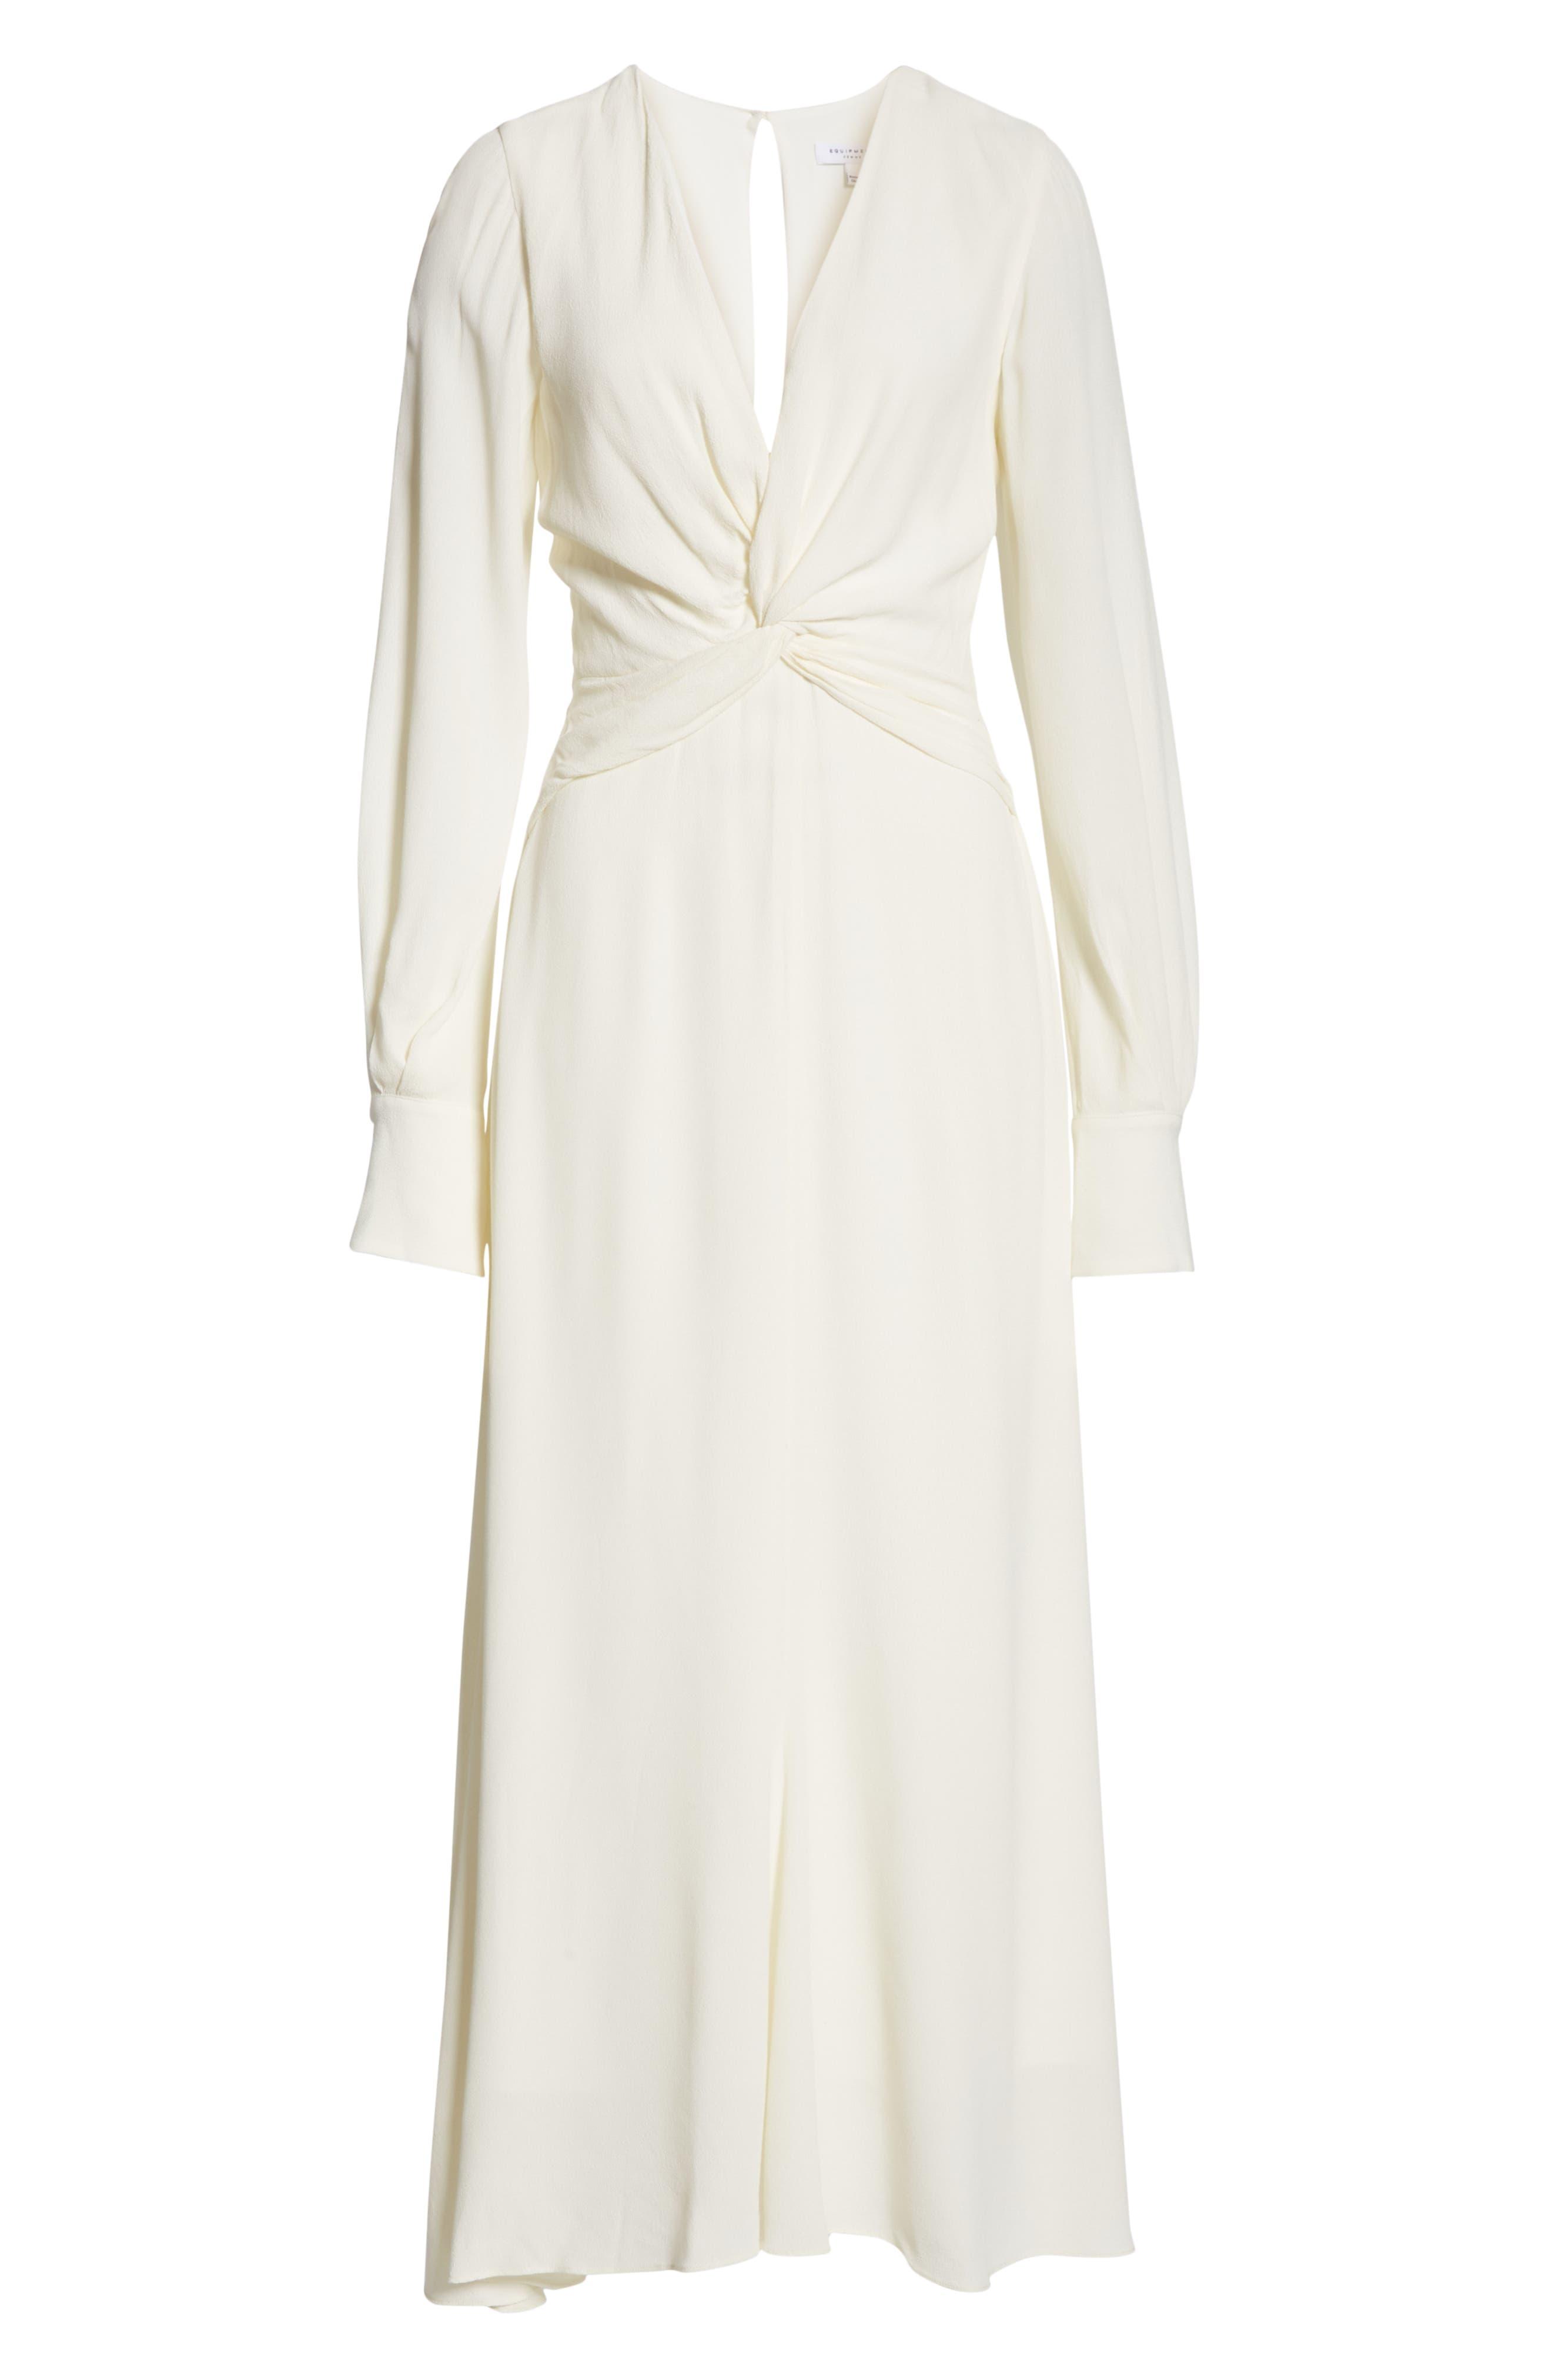 EQUIPMENT, Faun Twist Front Dress, Alternate thumbnail 6, color, NATURE WHITE